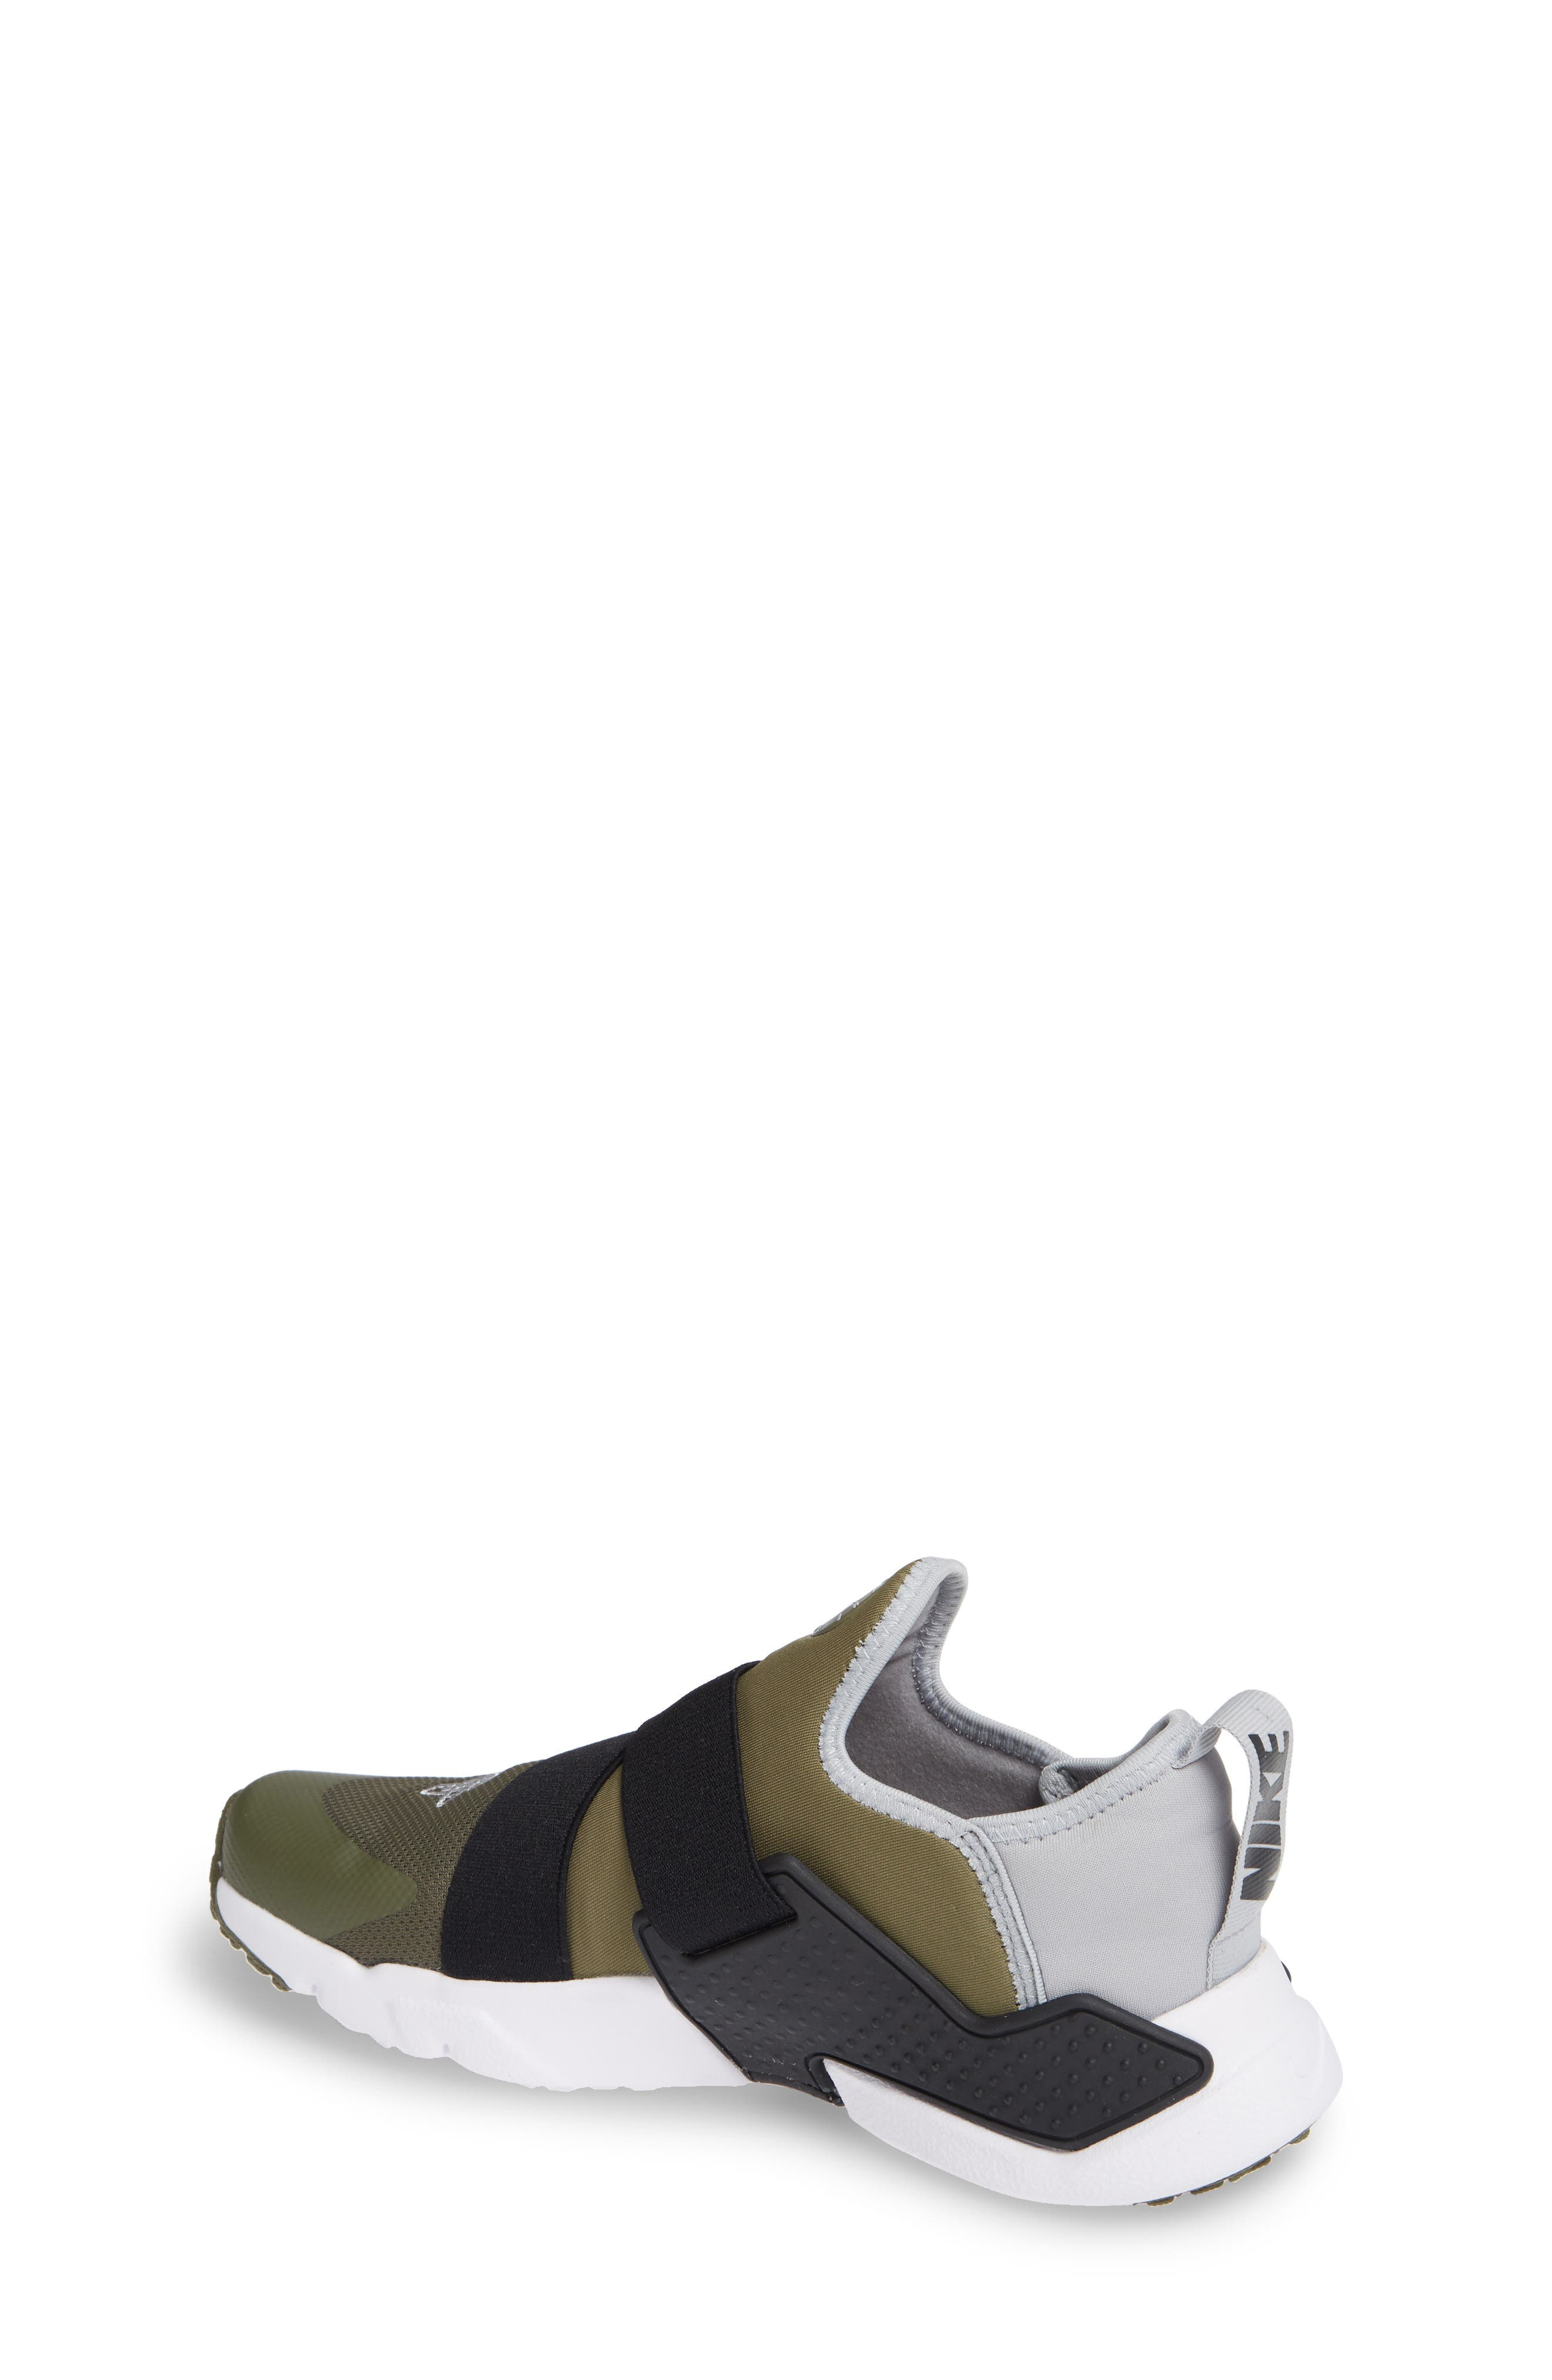 Huarache Extreme Sneaker,                             Alternate thumbnail 2, color,                             Olive/ Wolf Grey/ Black/ White